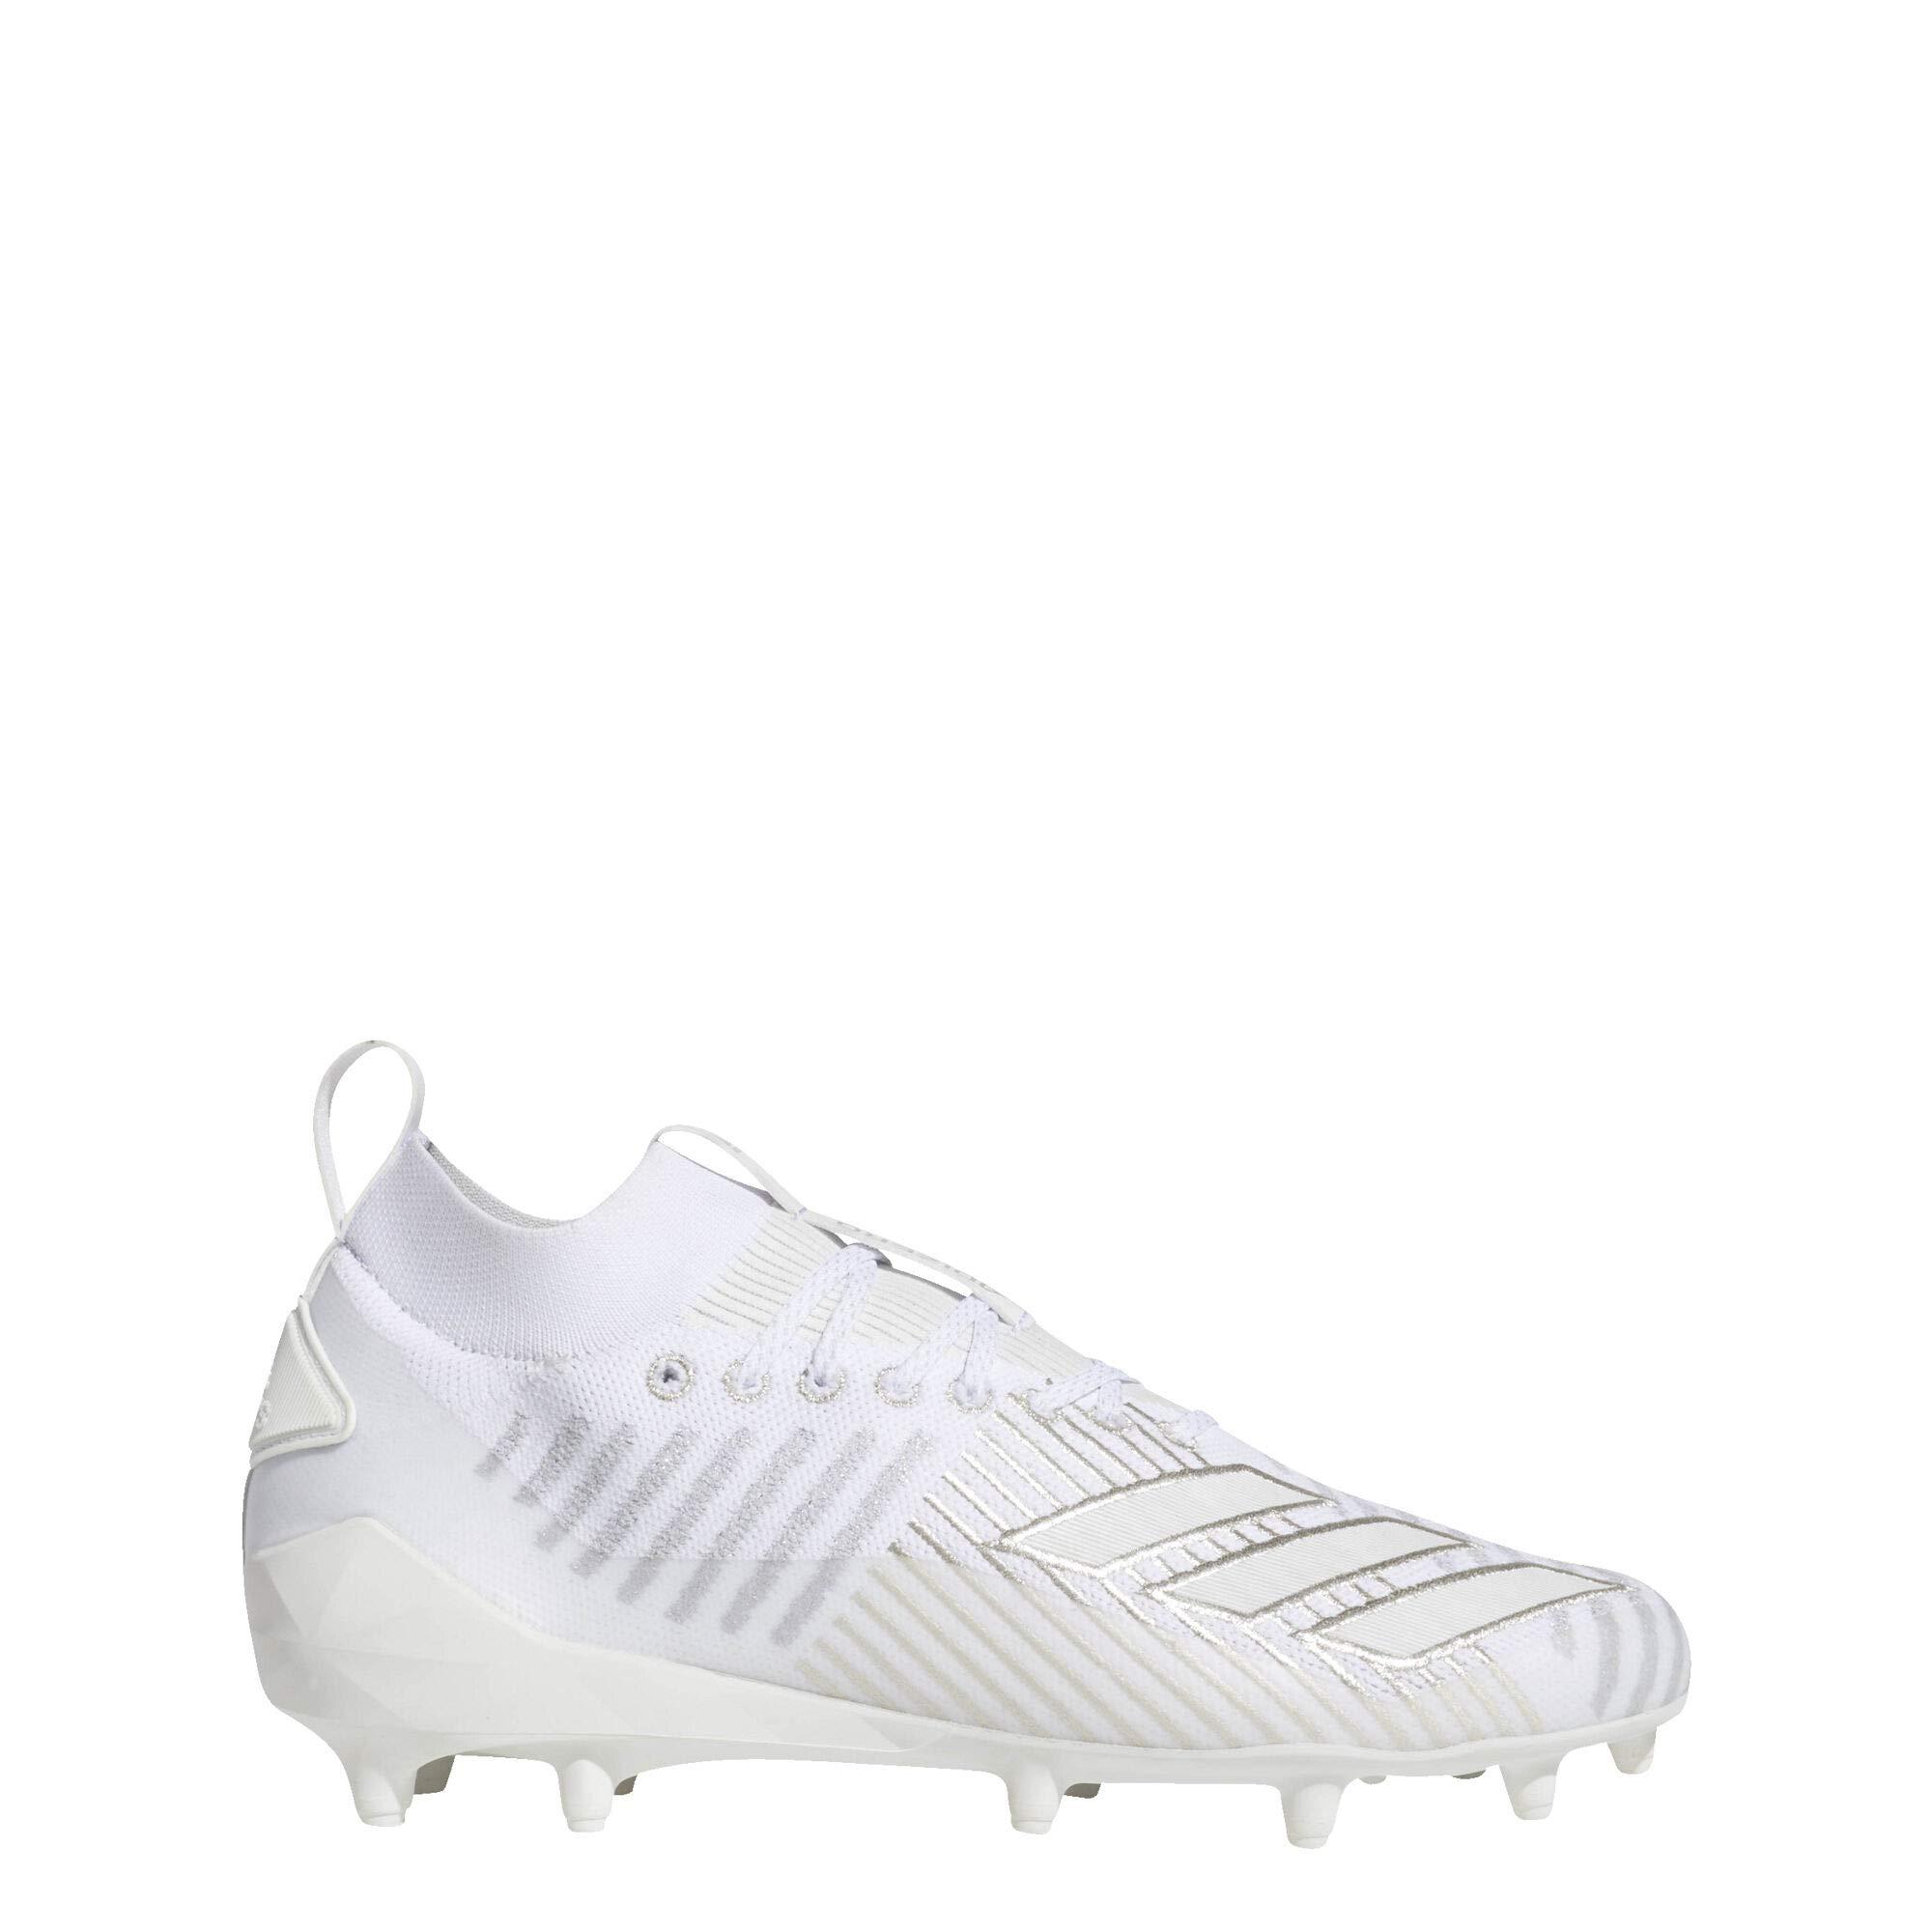 adidas Adizero Primeknit Cleats White